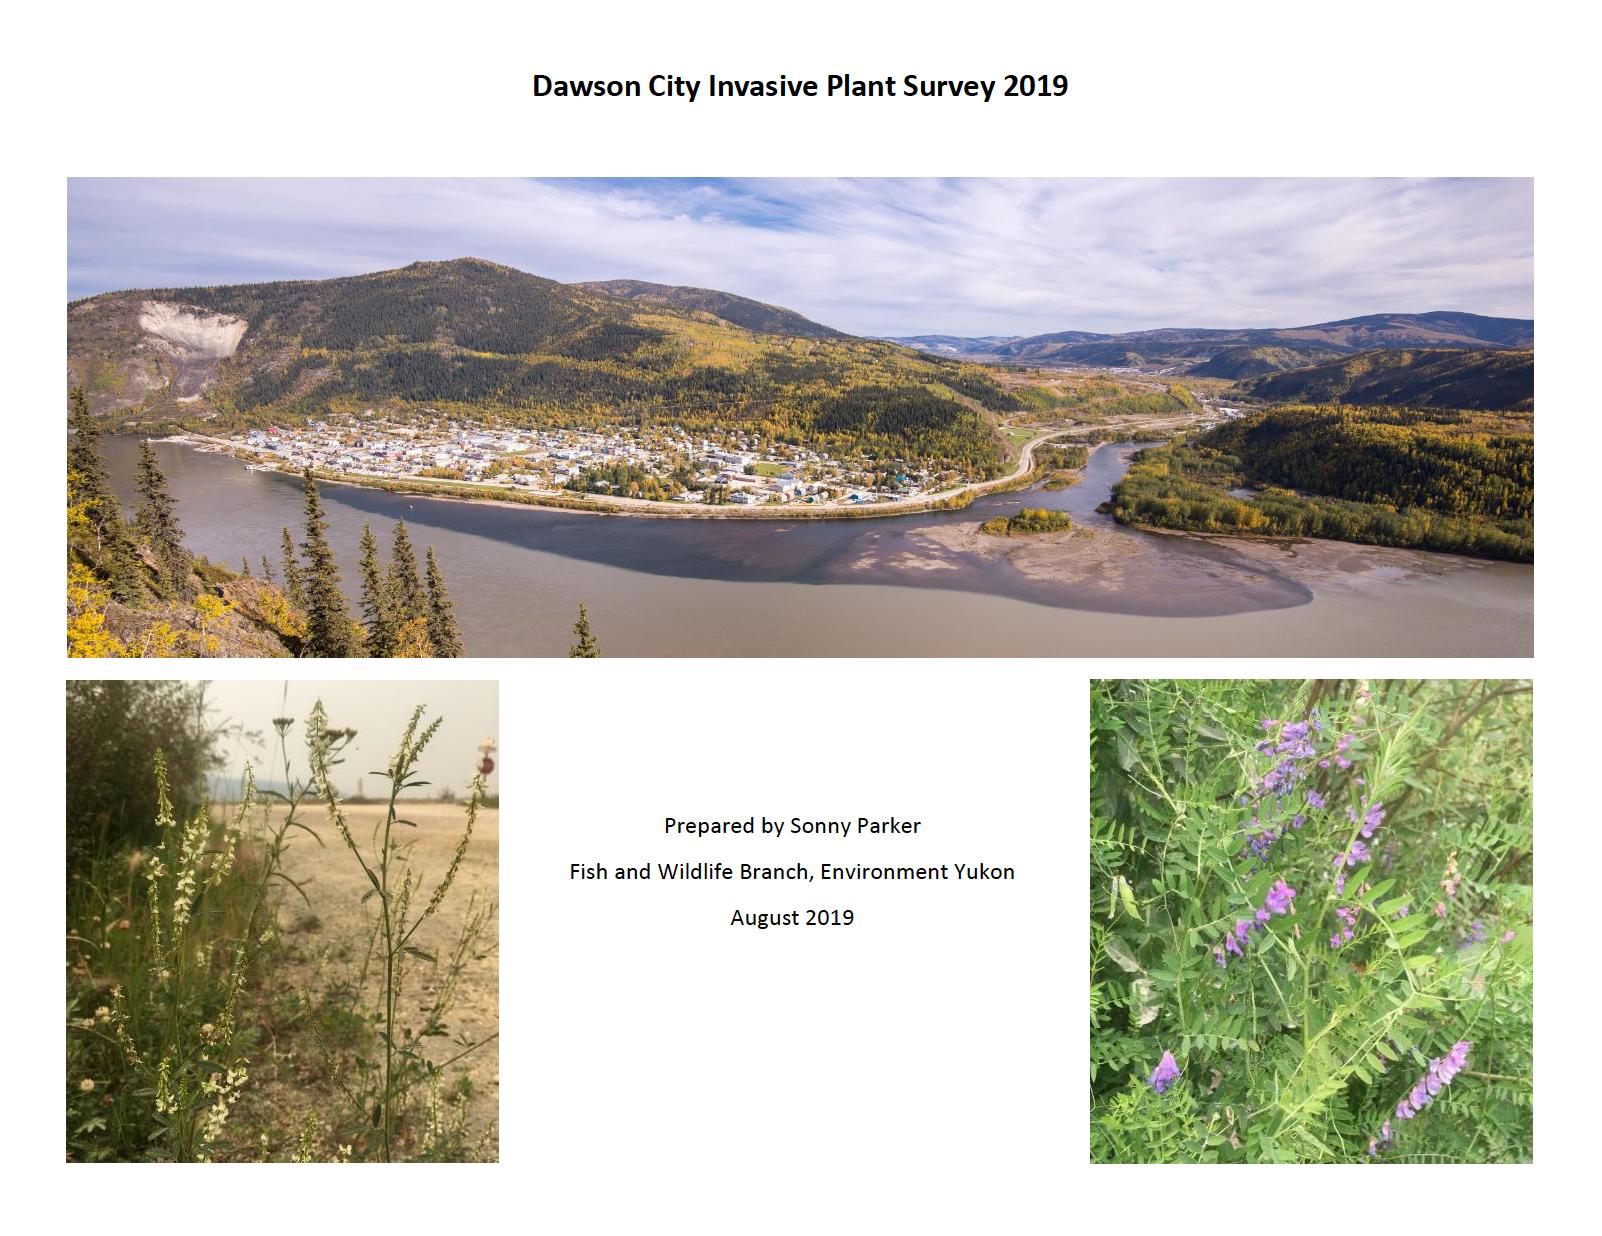 Invasive Plant Survey Dawson